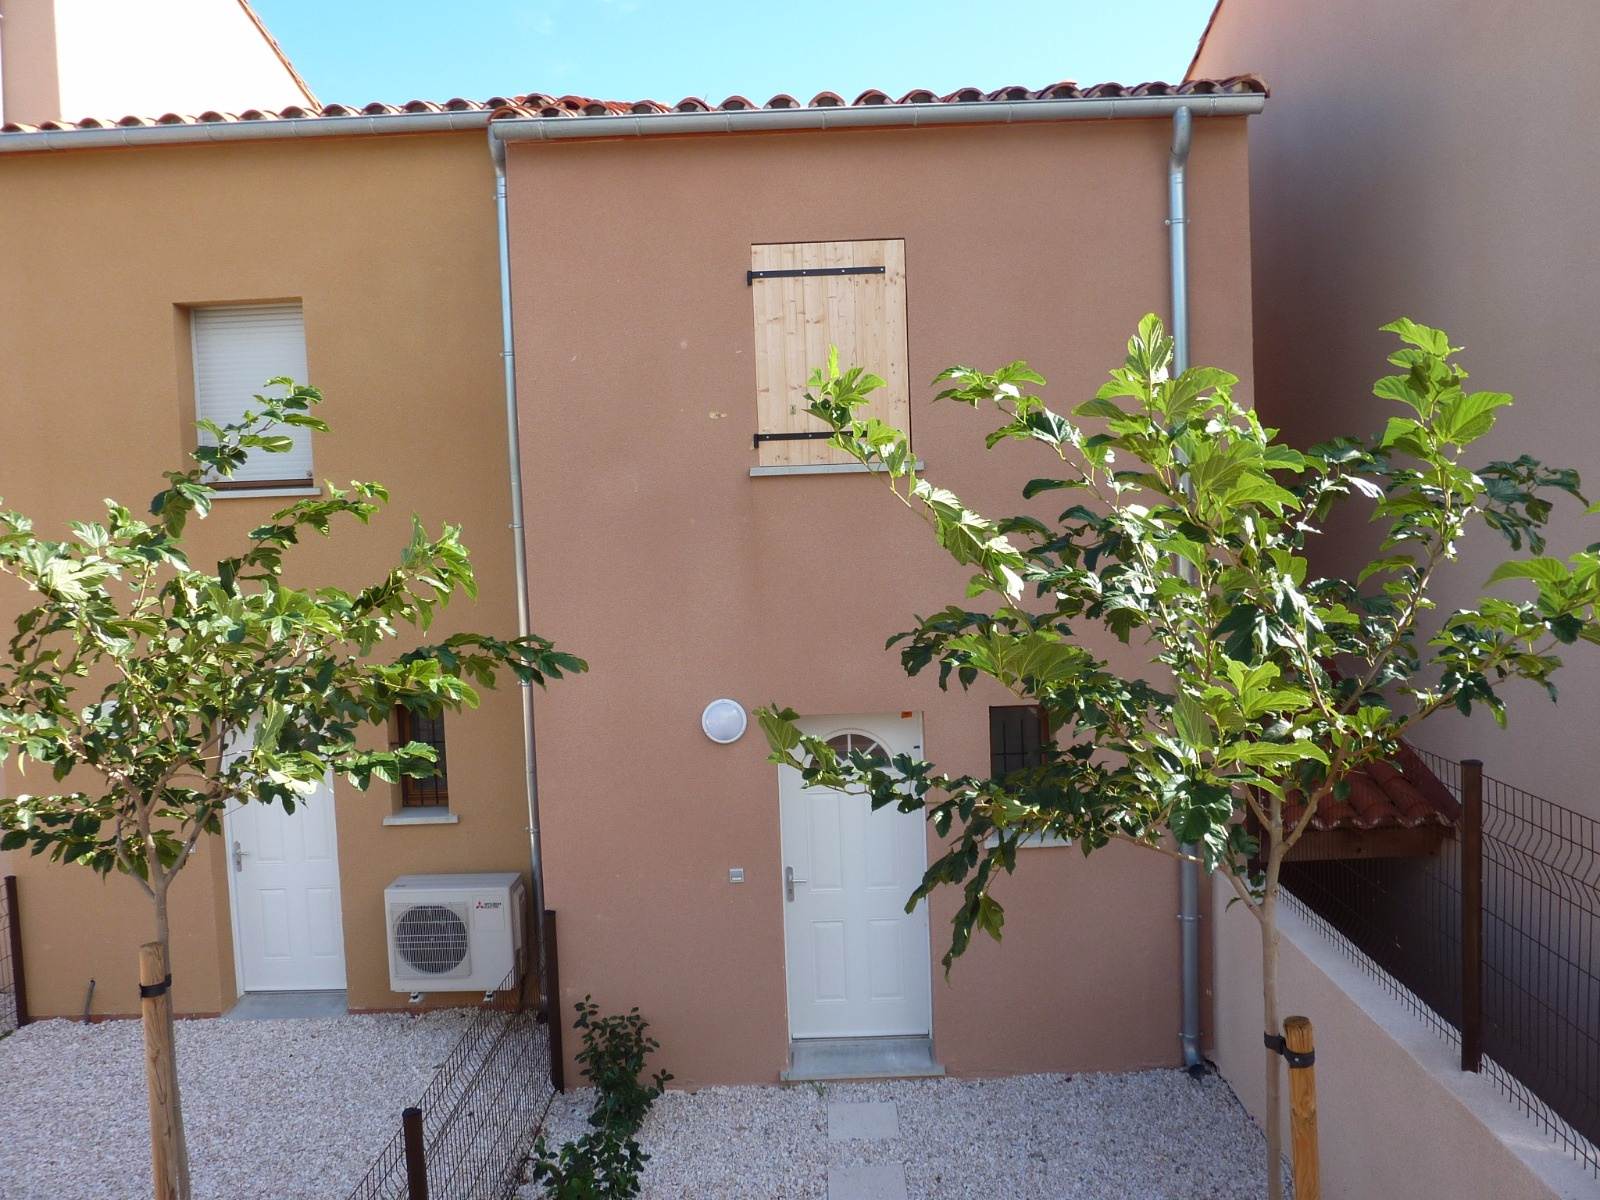 Vente villa neuve 4 pi ces collioure for Acheter maison collioure